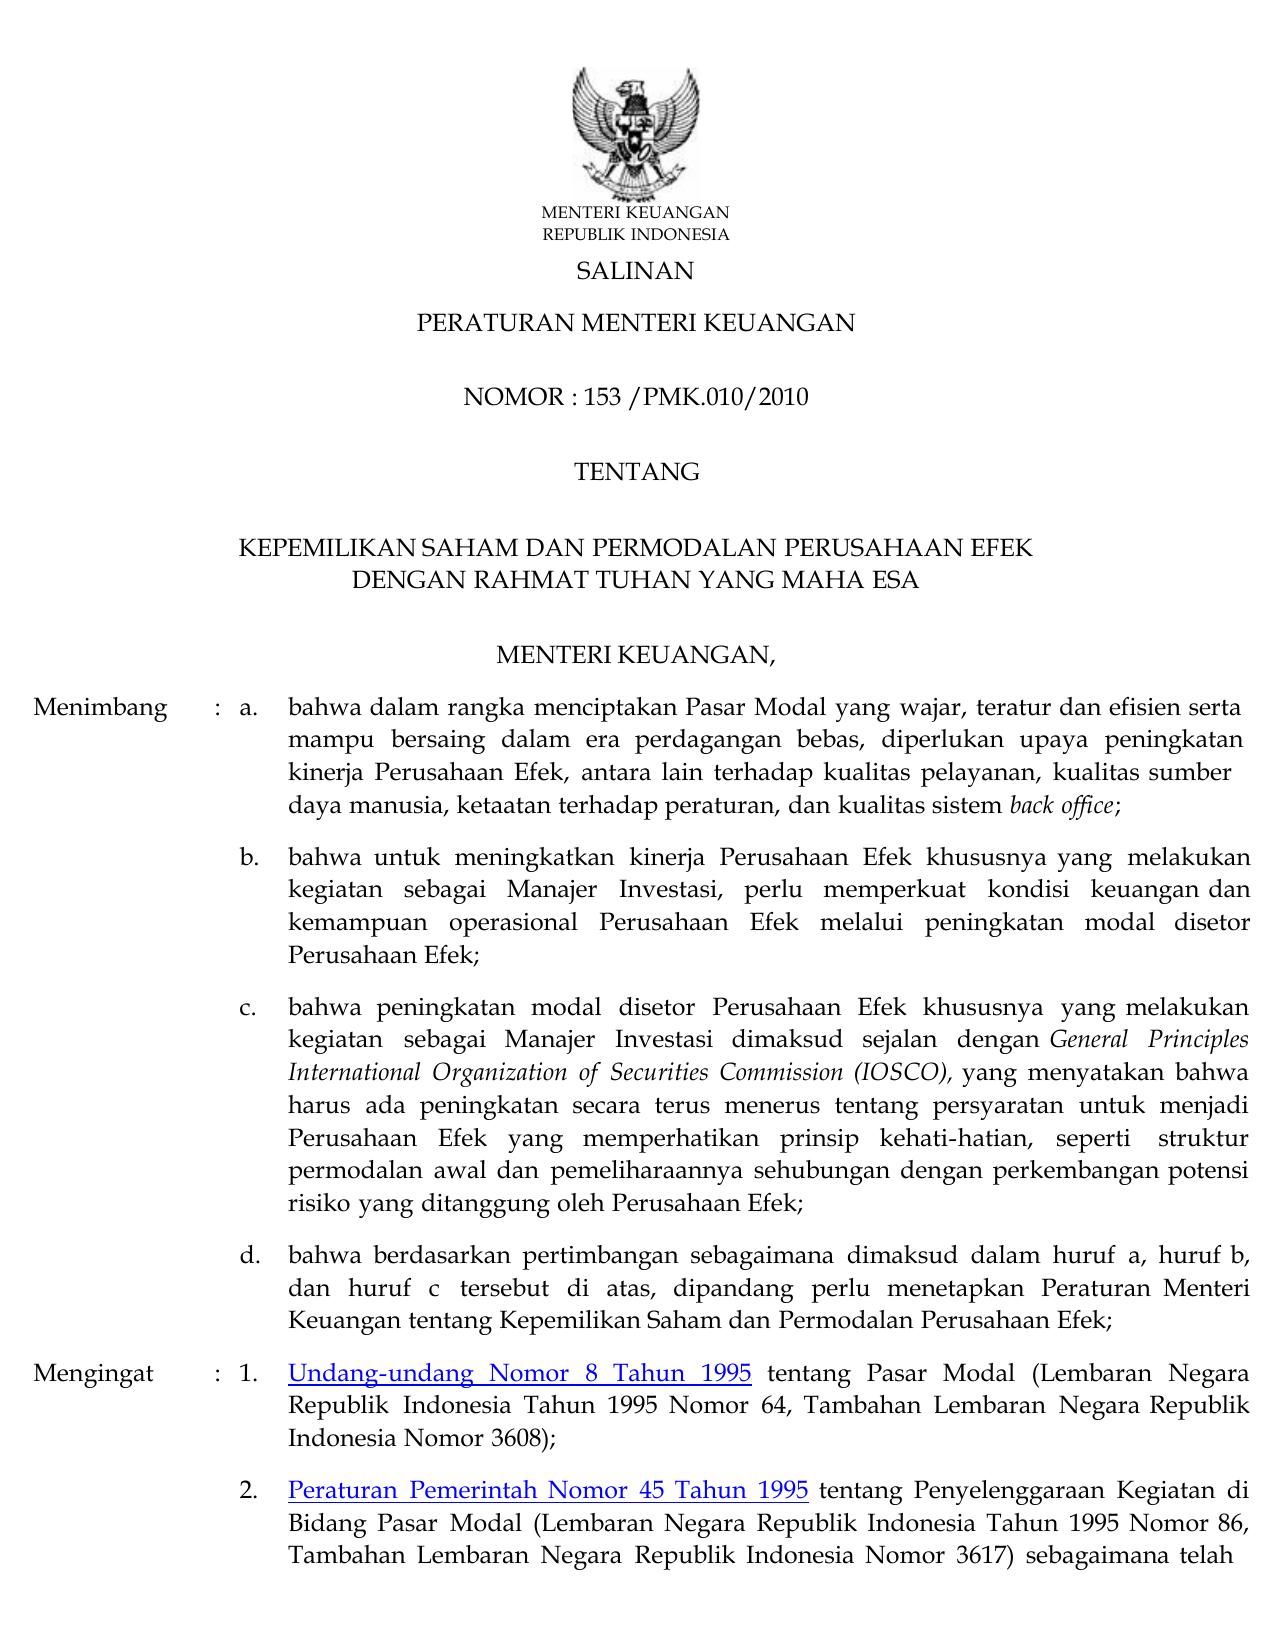 UU 7 tahun tentang Perdagangan | Jogloabang